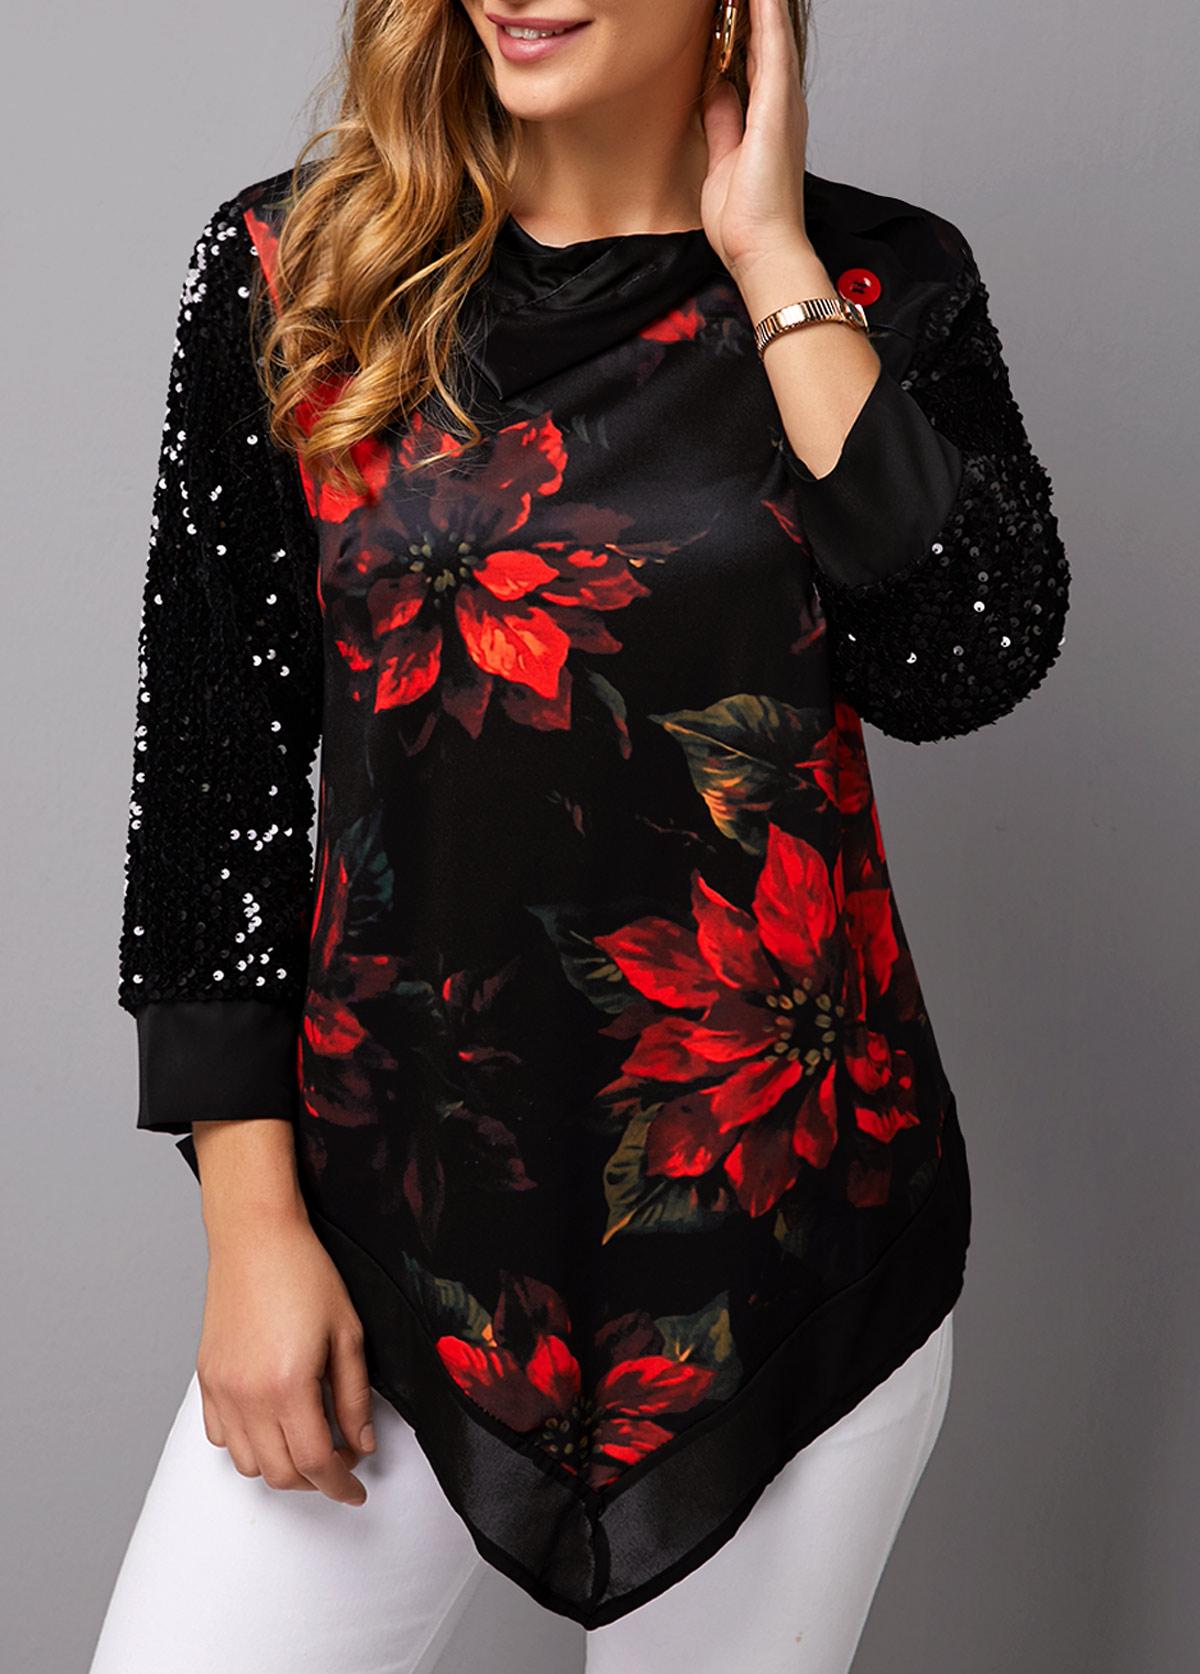 Asymmetric Hem Christmas Print Sequin Panel T Shirt